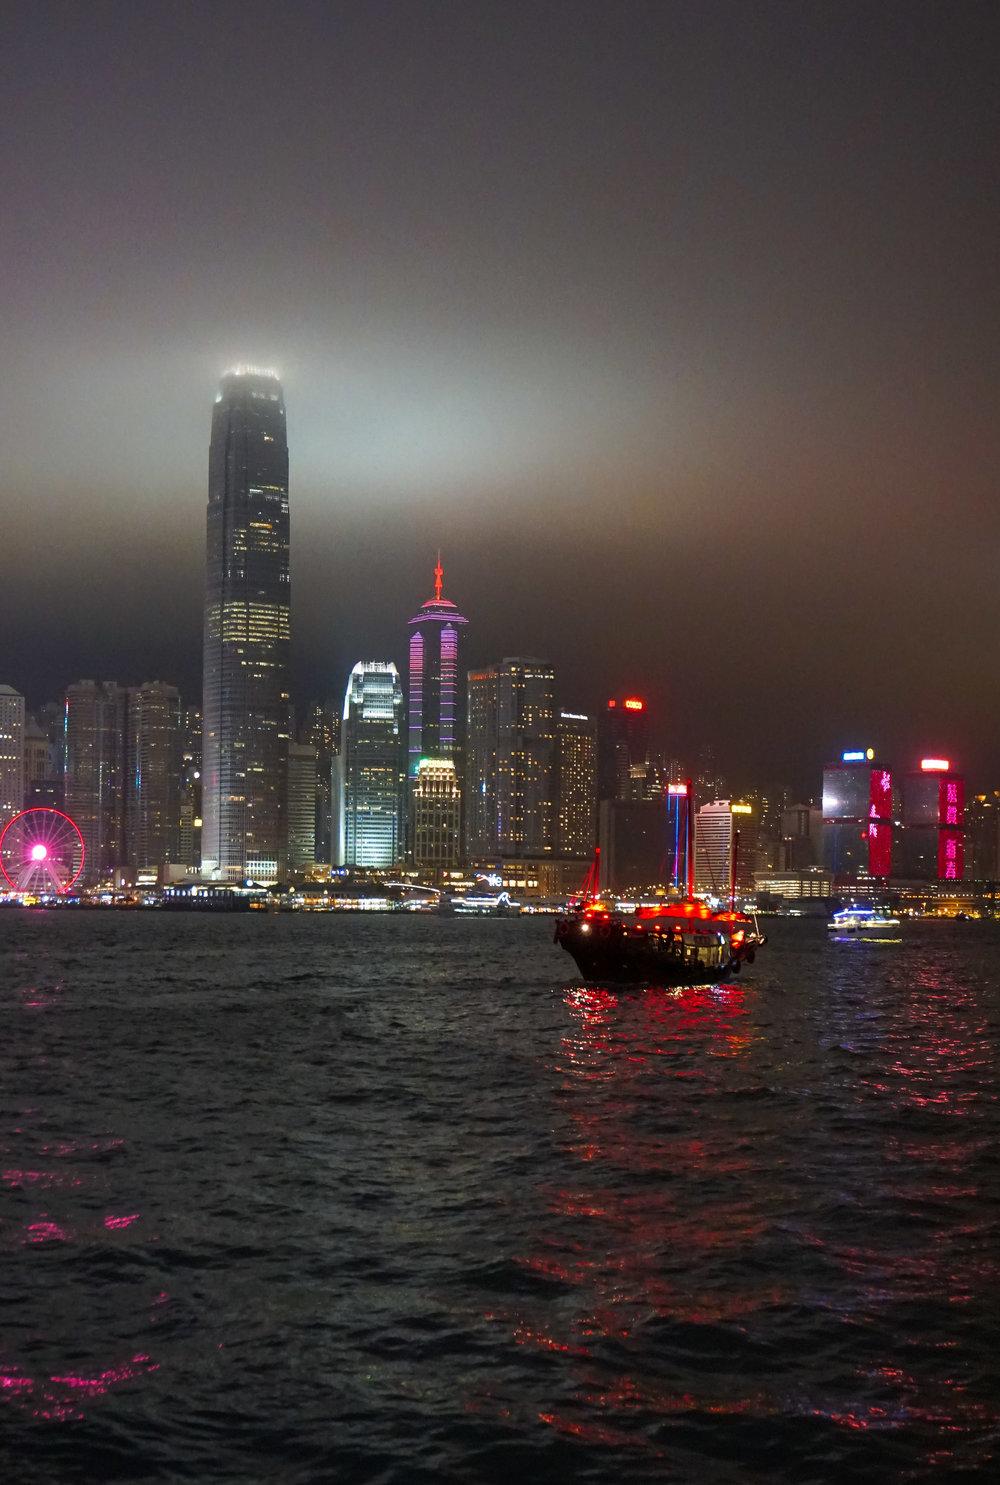 curio.trips.hong.kong.night.waterfront.junk.boat.portrait.jpg